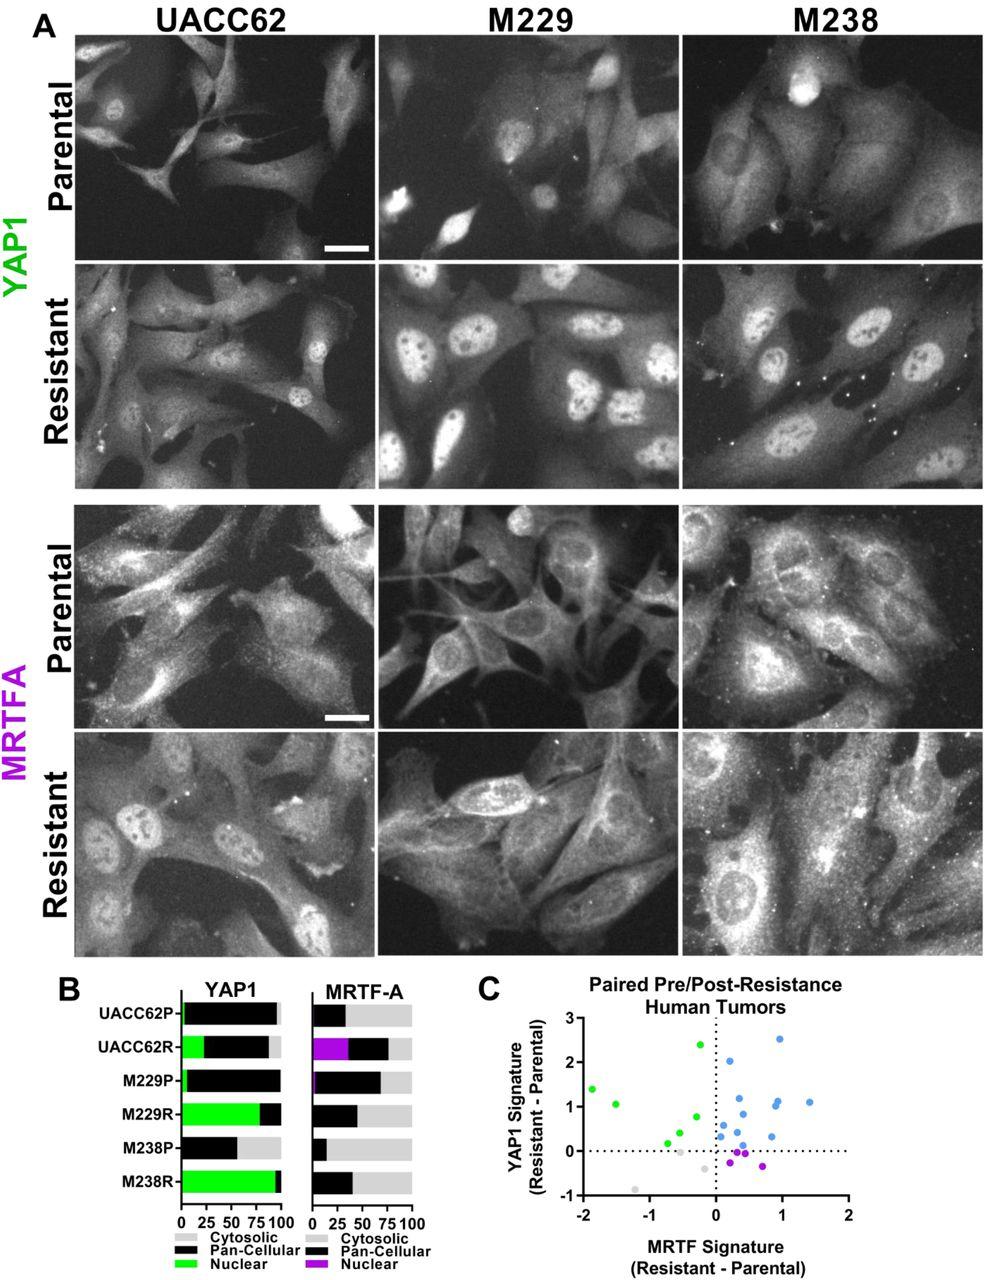 Rho-mediated gene transcription promotes BRAF inhibitor